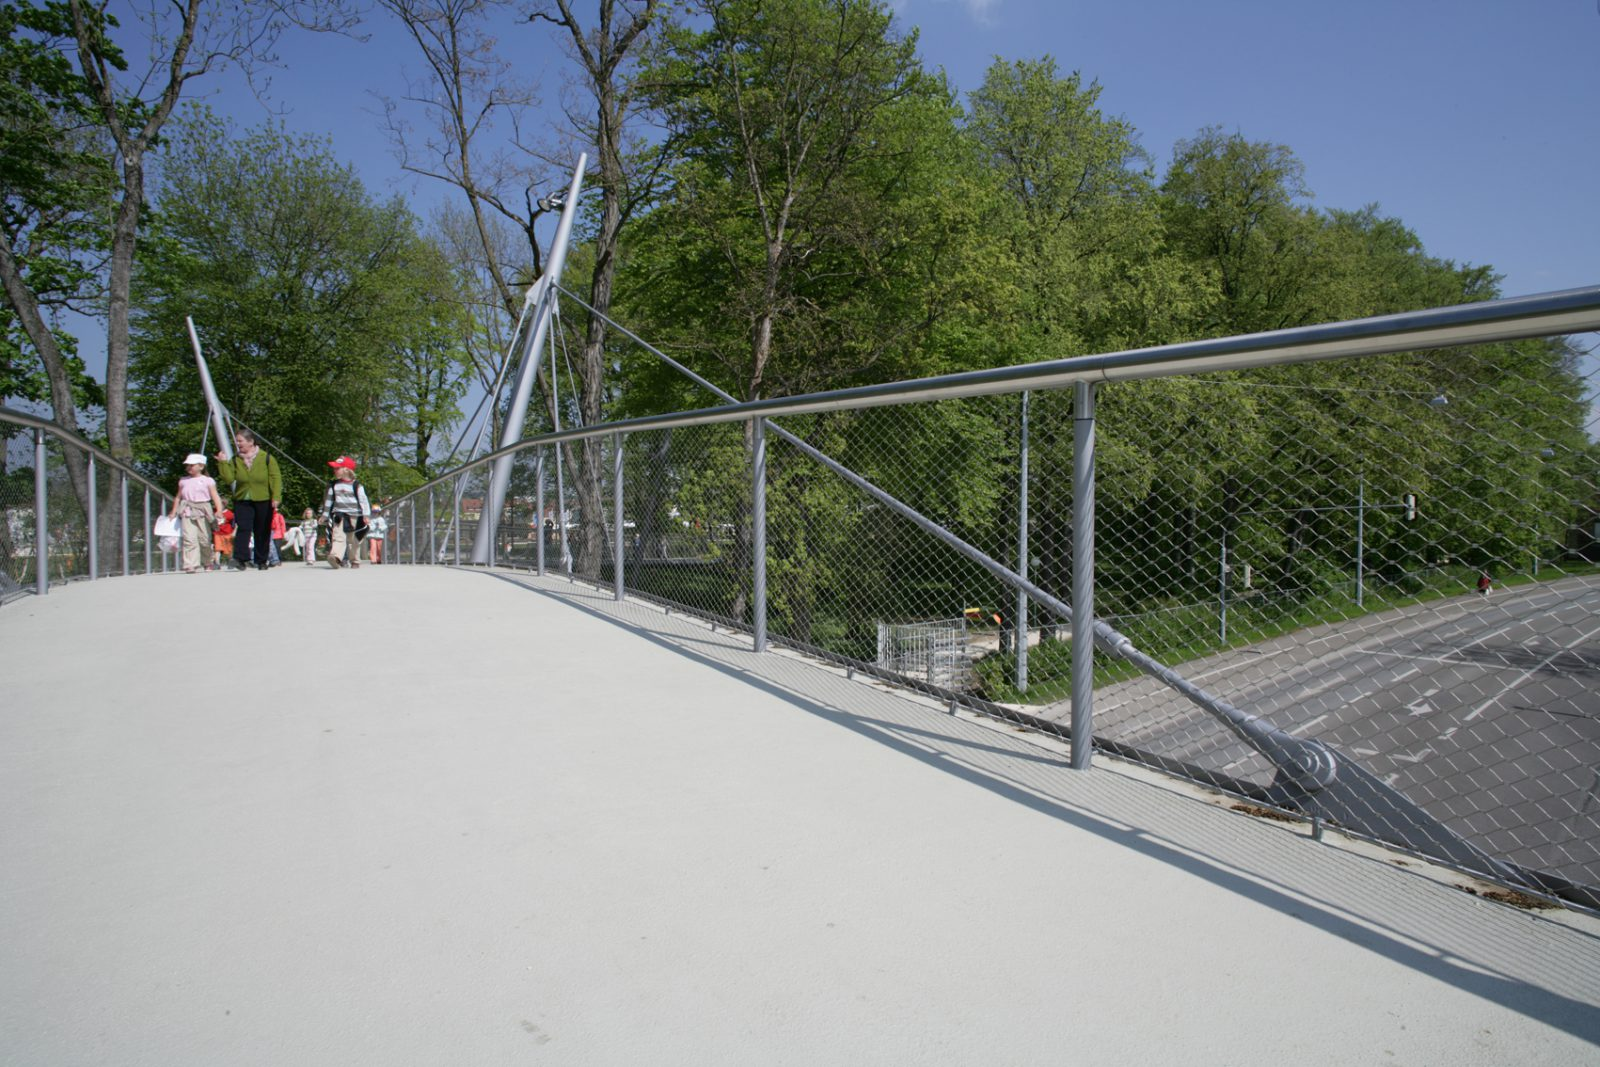 Fuß- und Radwegbrücke über die Ringstraße, Neu-UlmFuß- und Radwegbrücke über die Ringstraße, Neu-Ulm